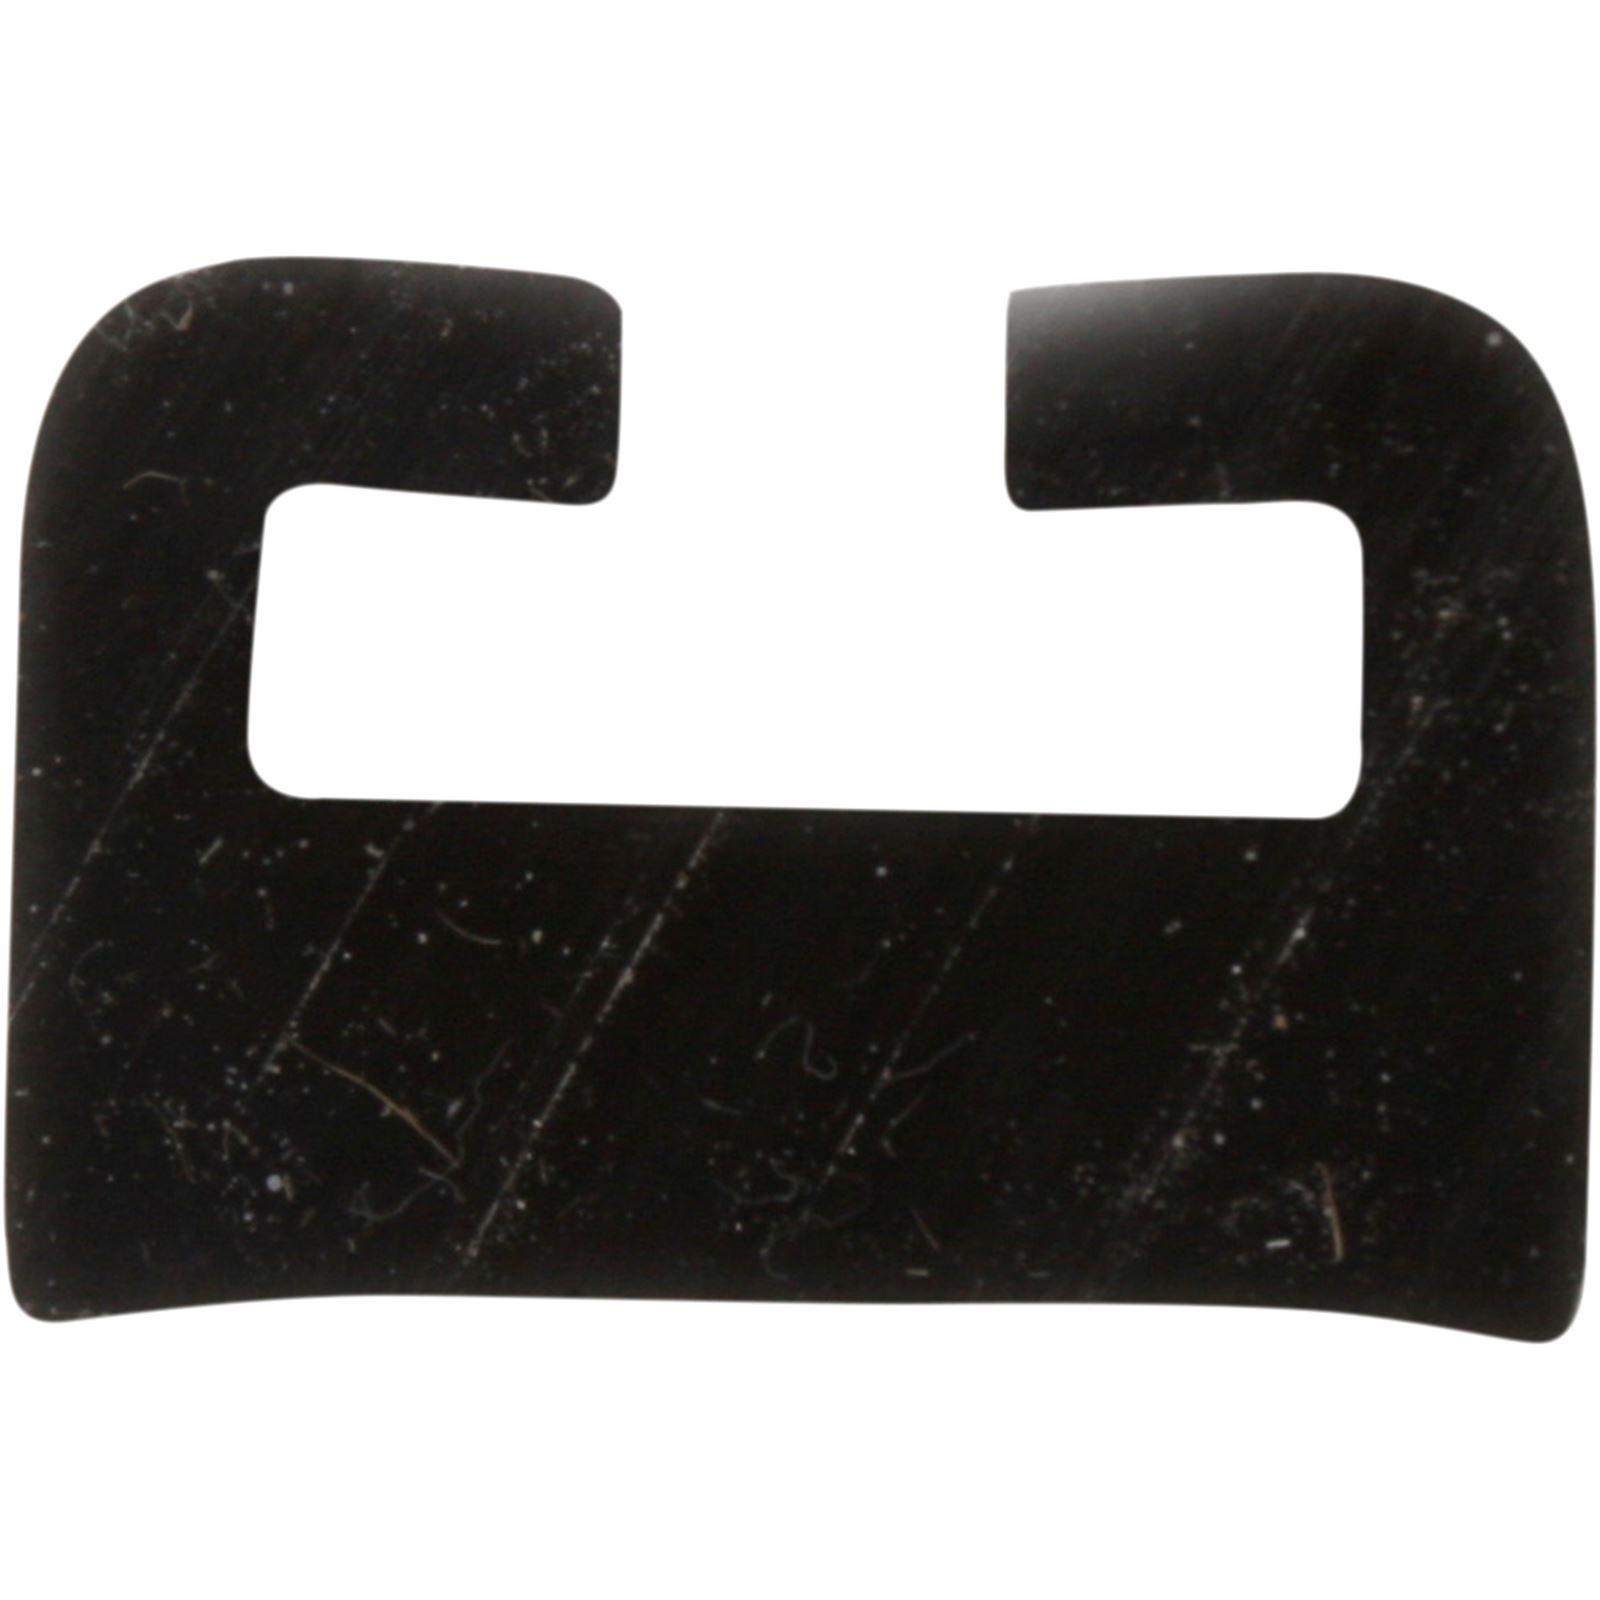 "Garland Black Replacement Slide - UHMW - Profile 10 - Length 64.00"" - Arctic Cat"